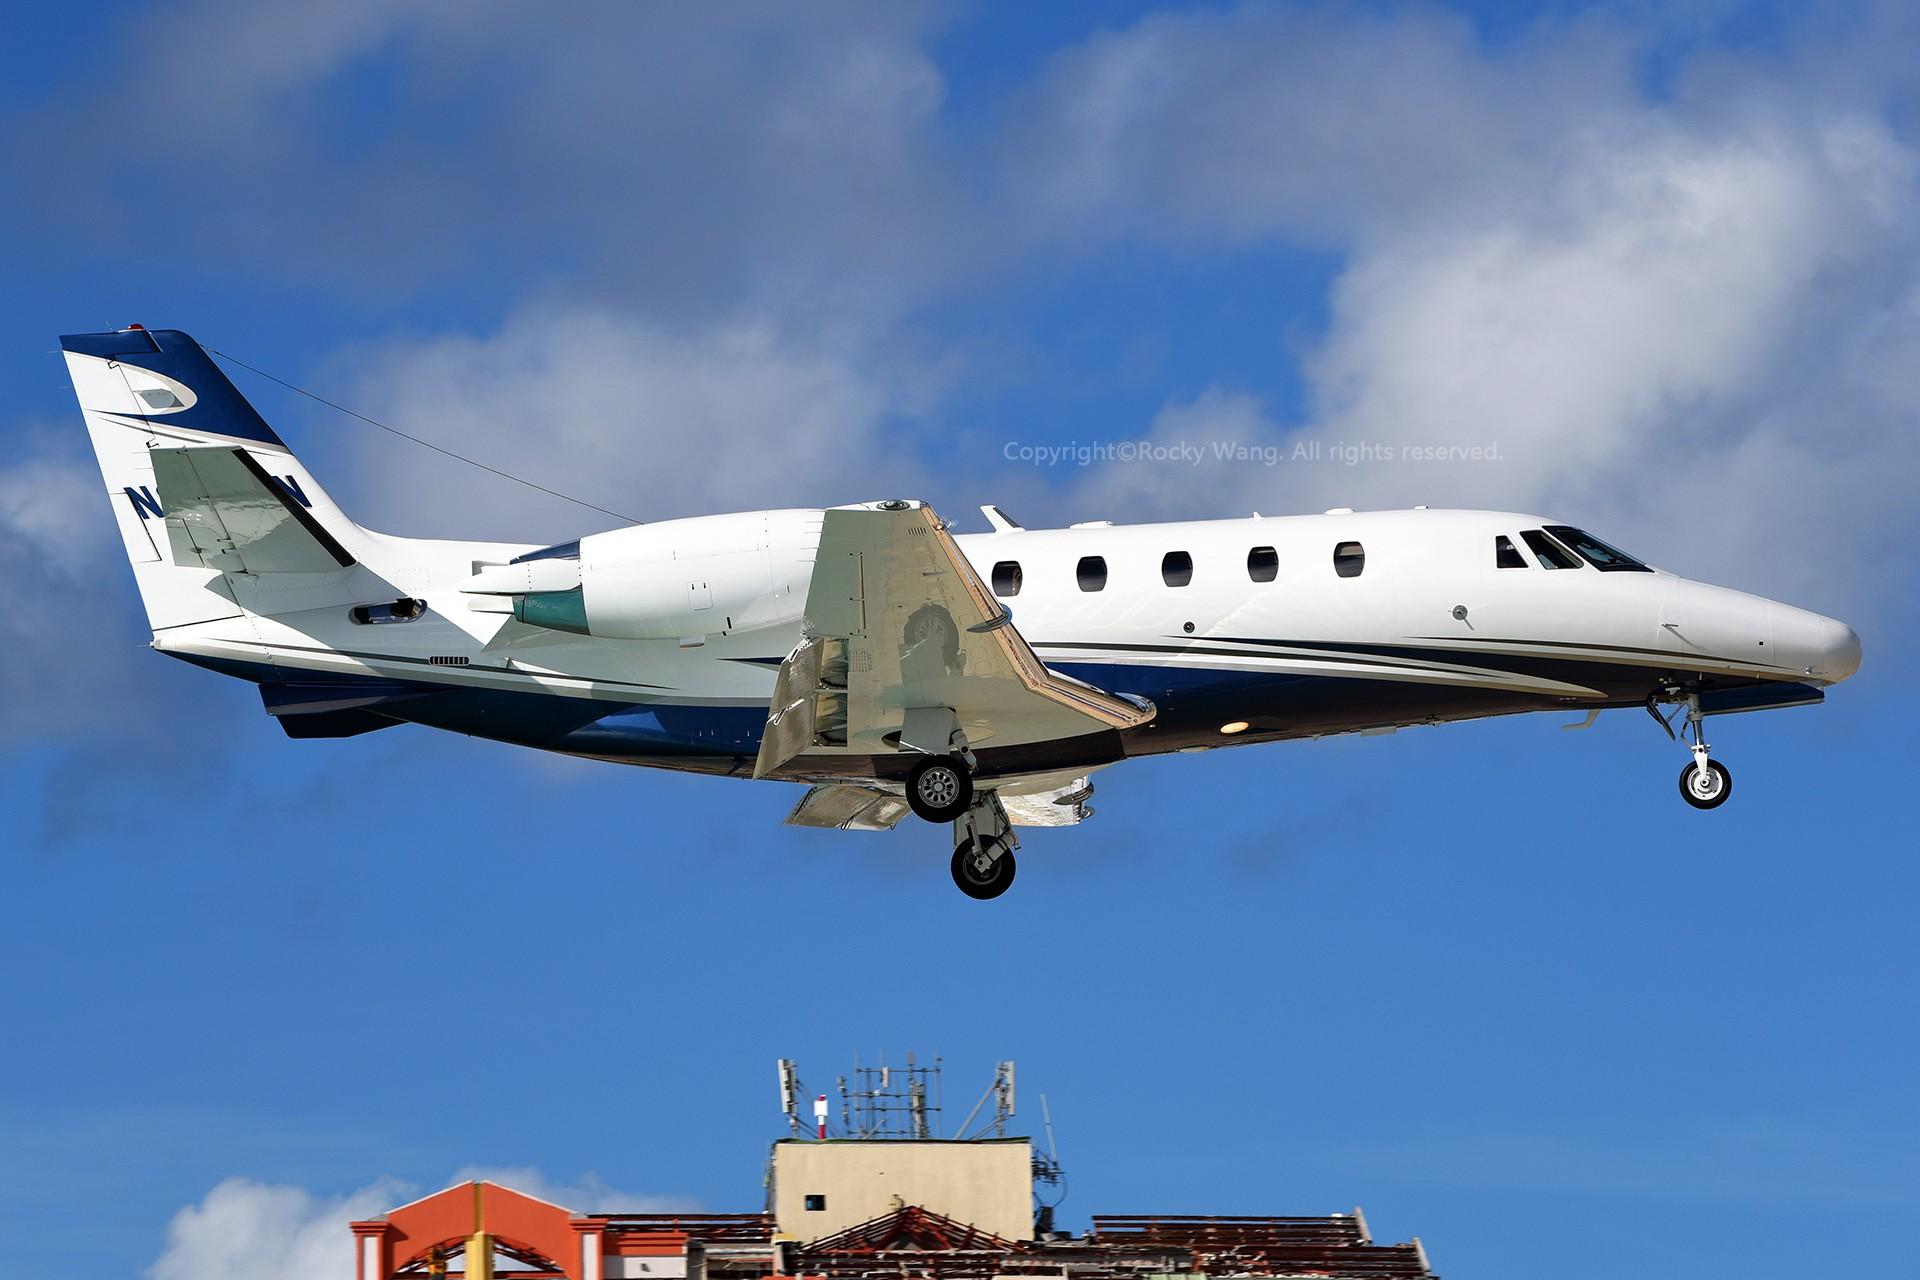 Re:[原创]My endless Caribbean dream——圣马丁朱莉安娜公主机场拍机记 CESSNA 560XL CITATION EXCEL N3750N 荷属安的列斯群岛朱利安娜公主机场